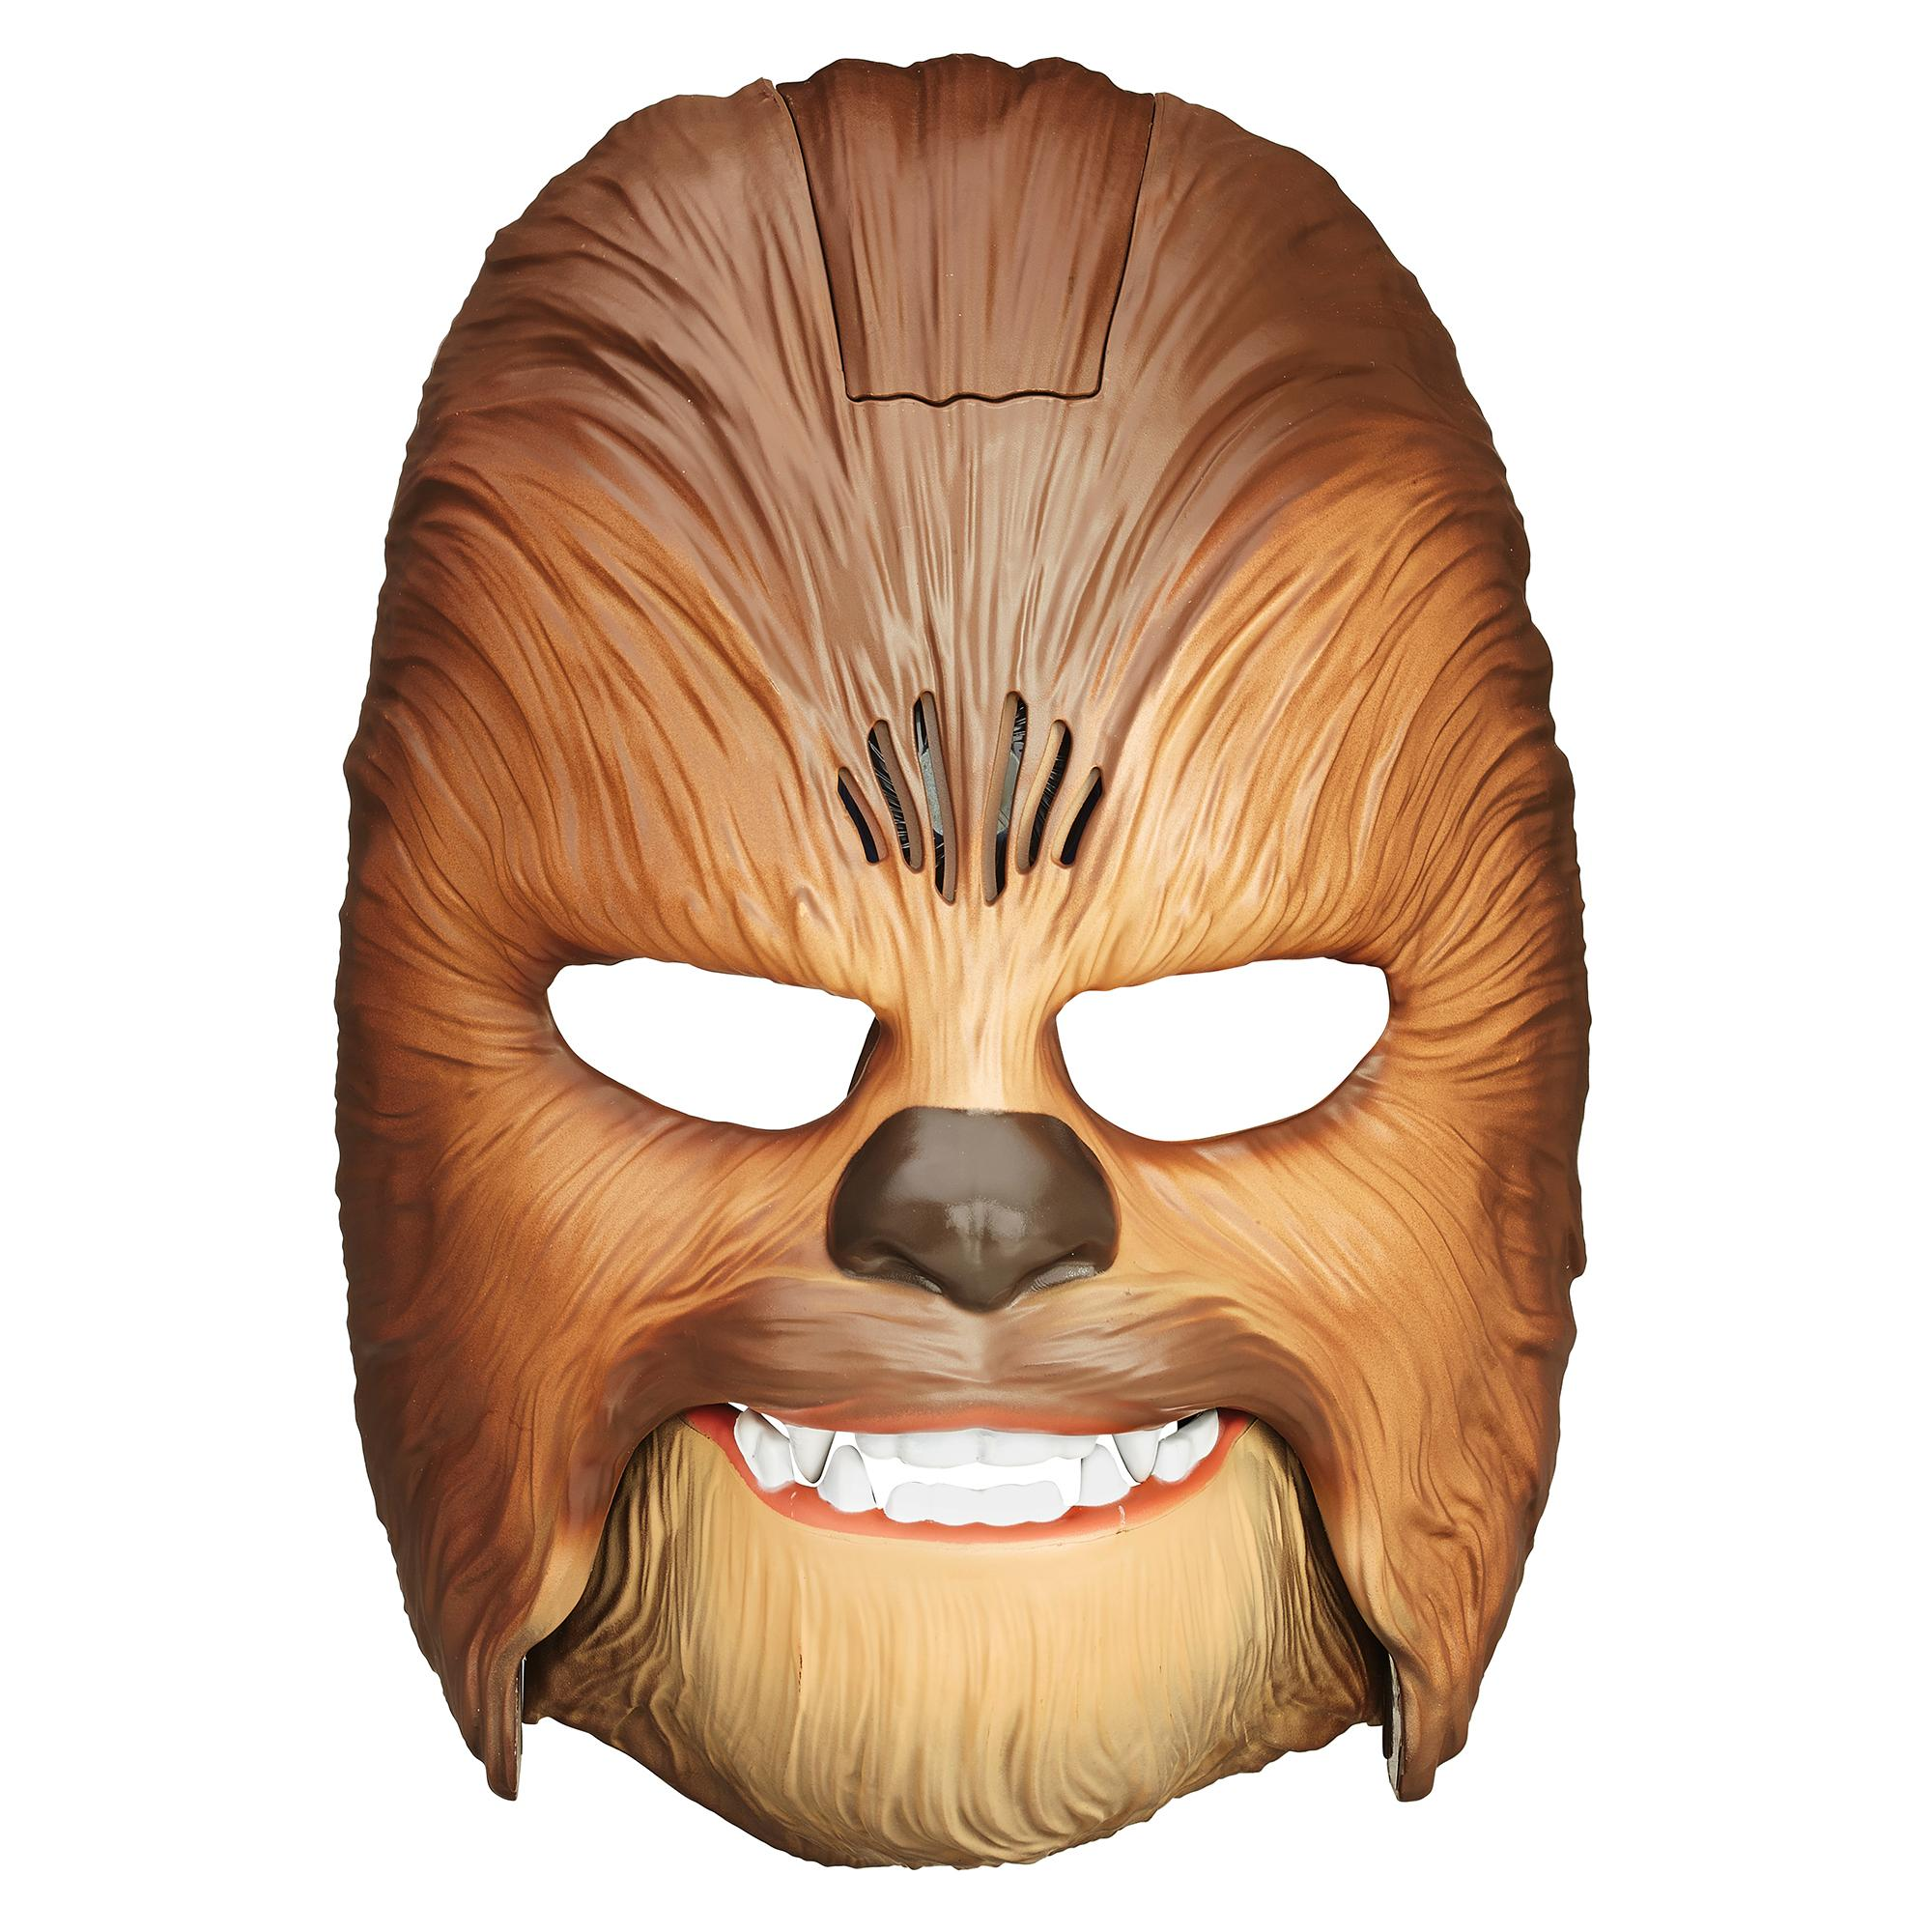 Star Wars The Force Awakens Máscara electrónica de Chewbacca